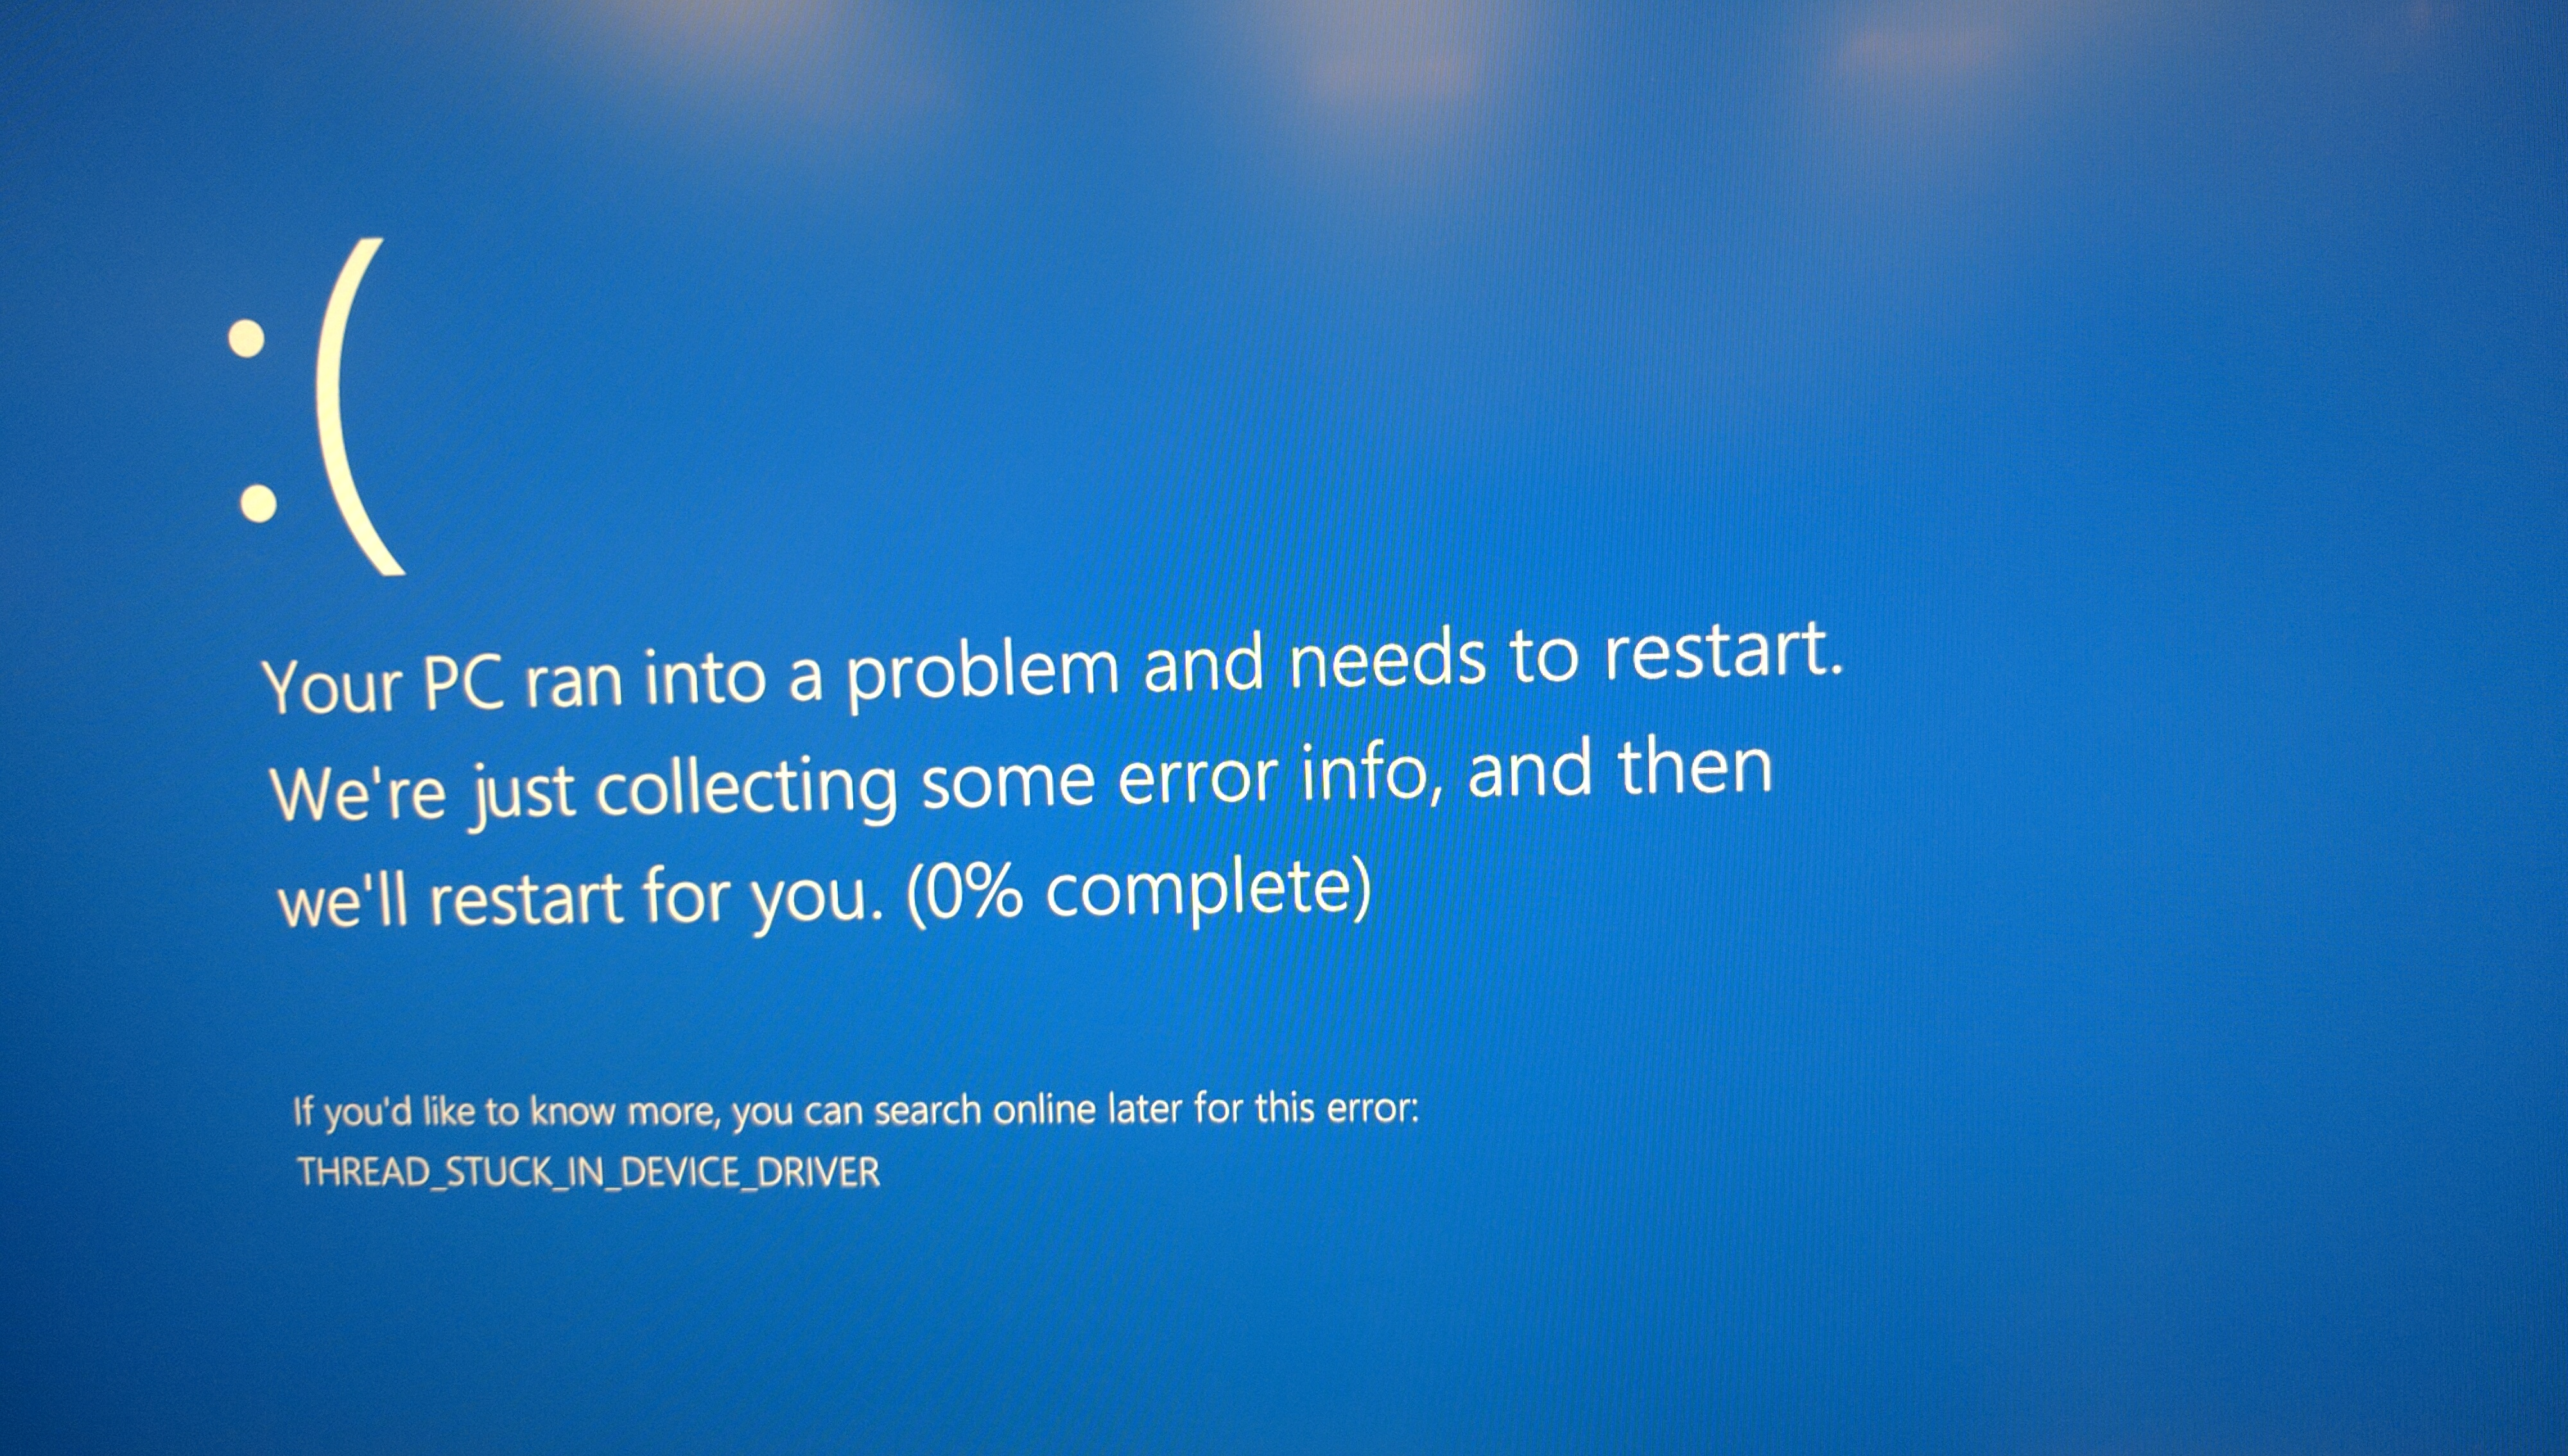 Install Windows dual-boot to Mac Pro using OWC SSD – St